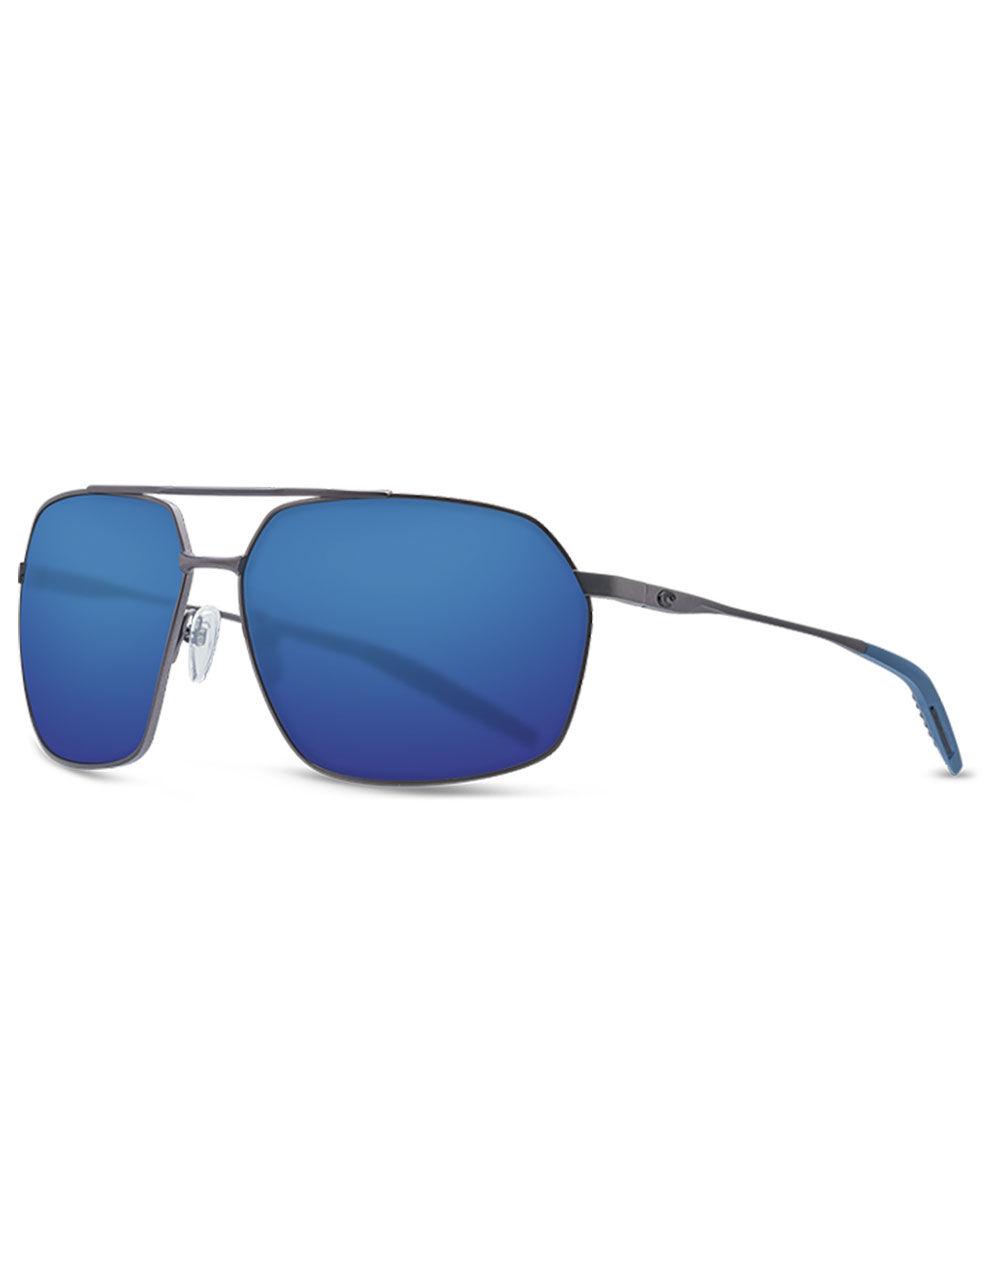 COSTA Pilothouse Matte Dark Gunmetal & Blue Mirror Polarized Sunglasses